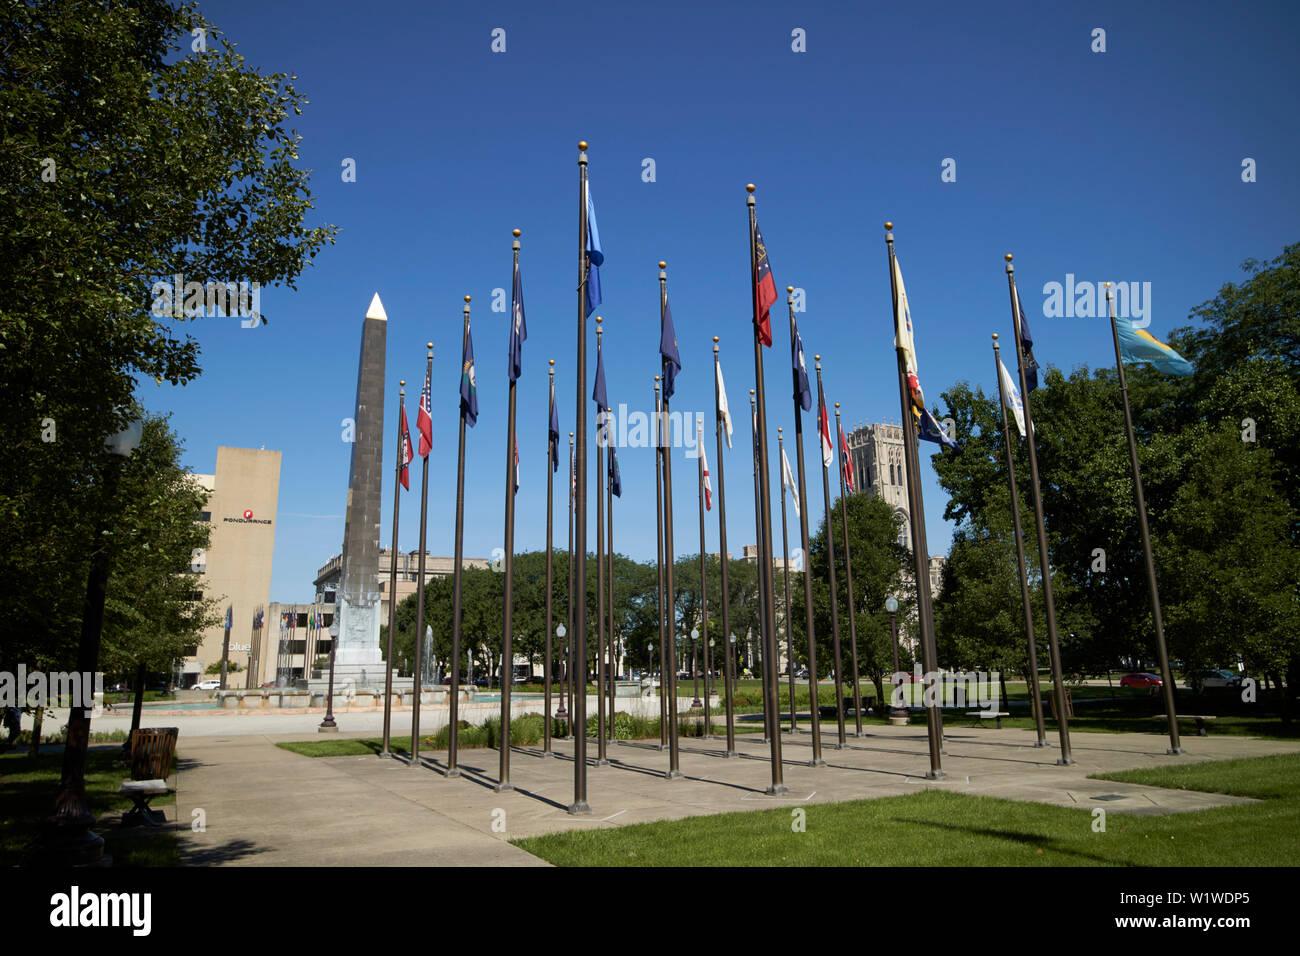 veterans memorial plaza in ndianapolis Indiana USA - Stock Image